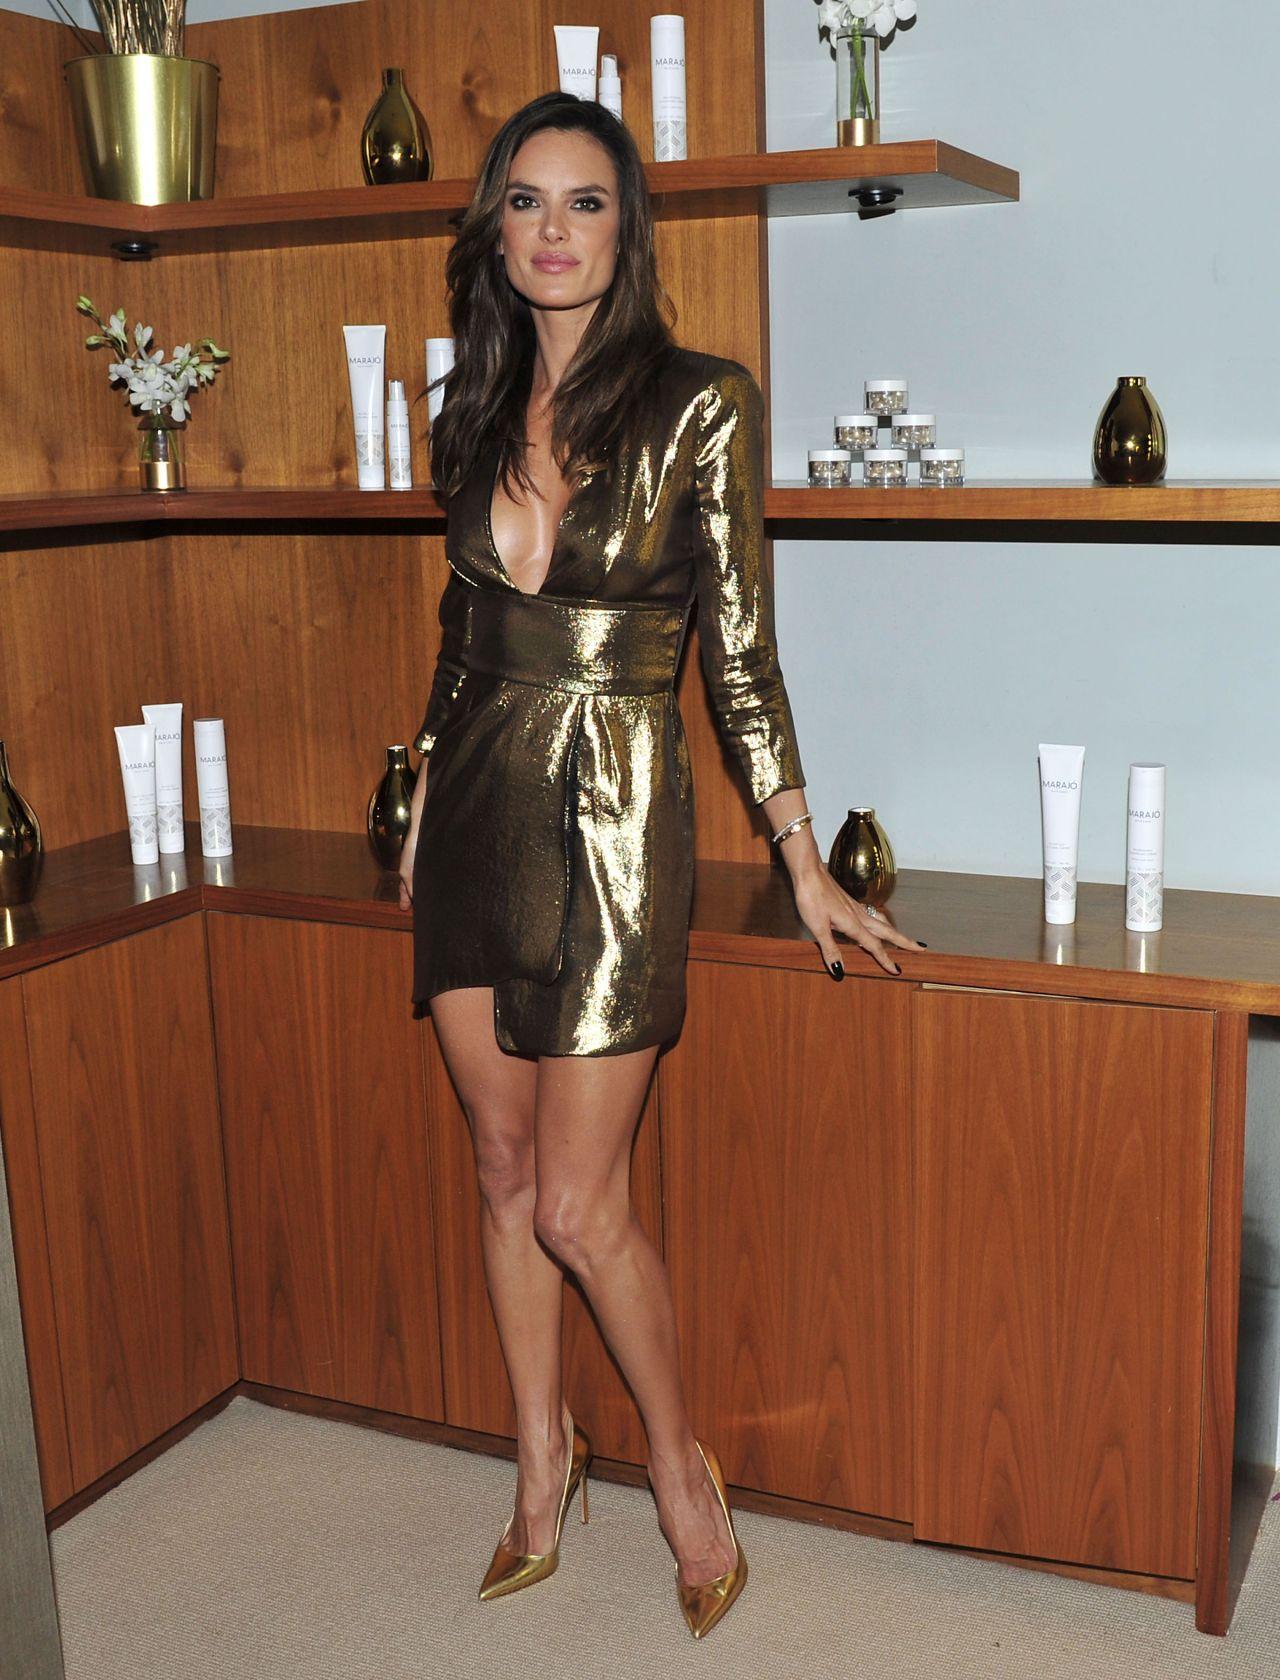 Alessandra Ambrosio - ... Alessandra Ambrosio Twitter